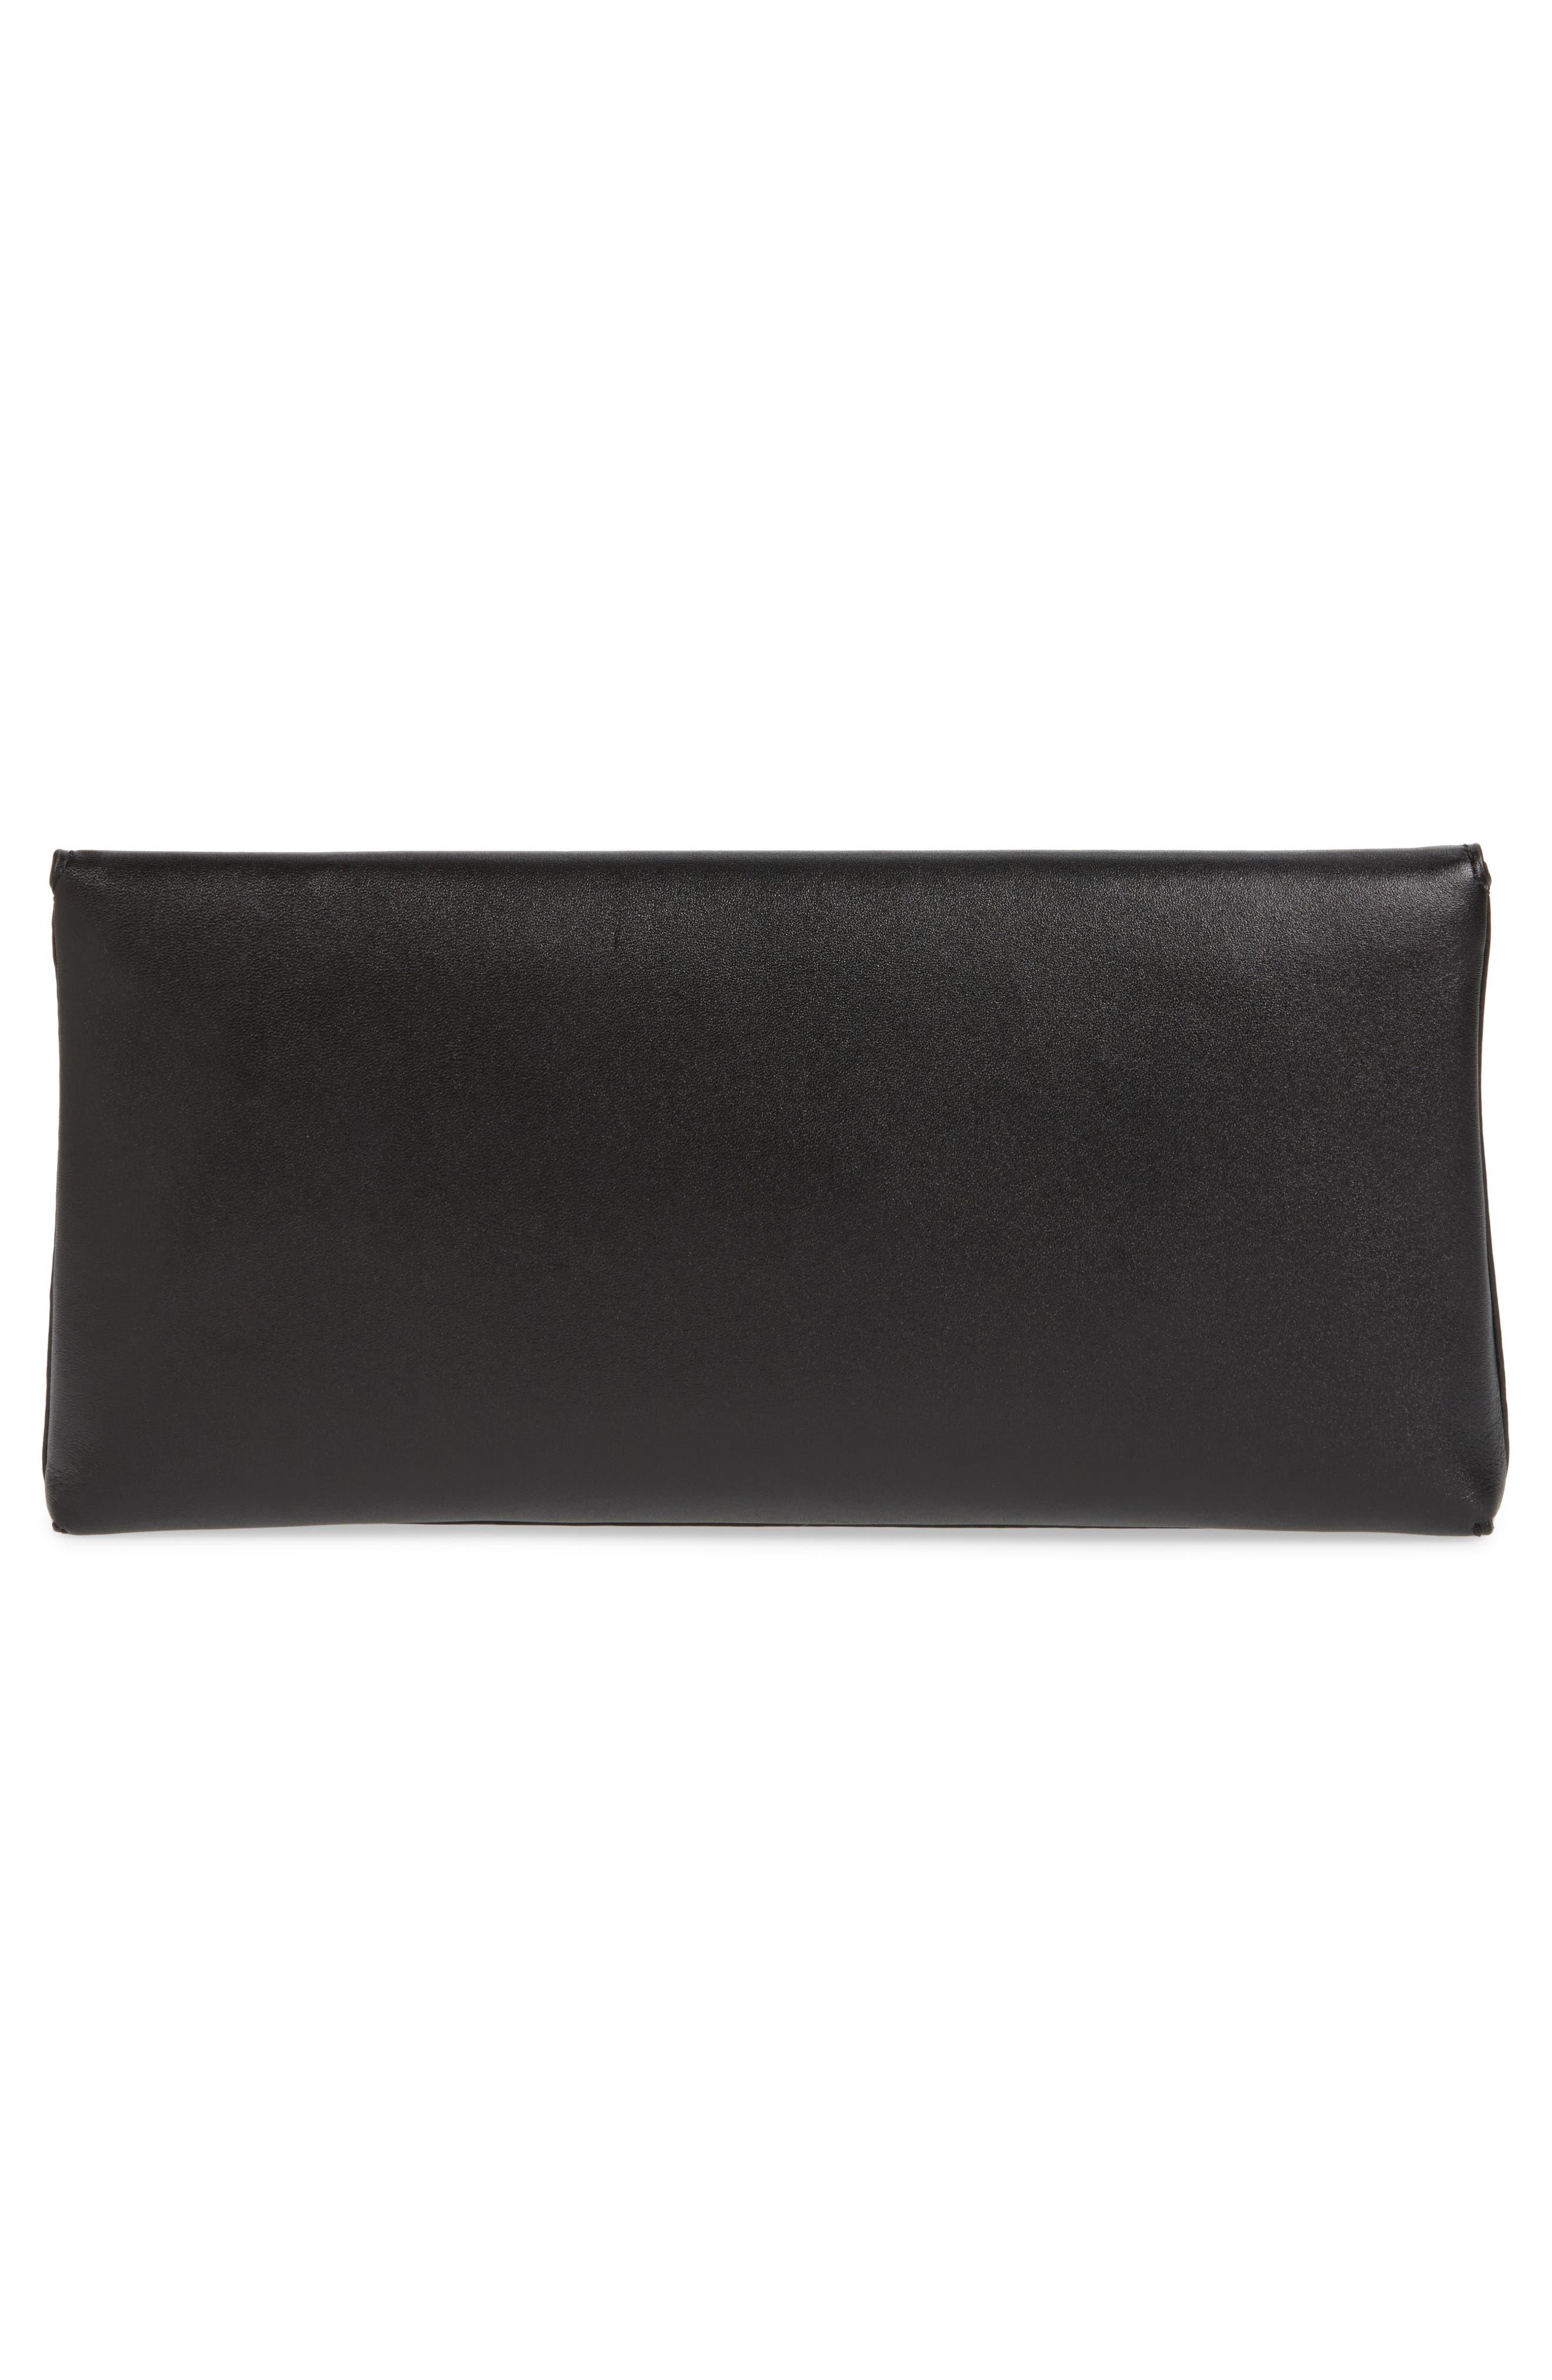 Miller Leather Clutch,                             Alternate thumbnail 3, color,                             BLACK